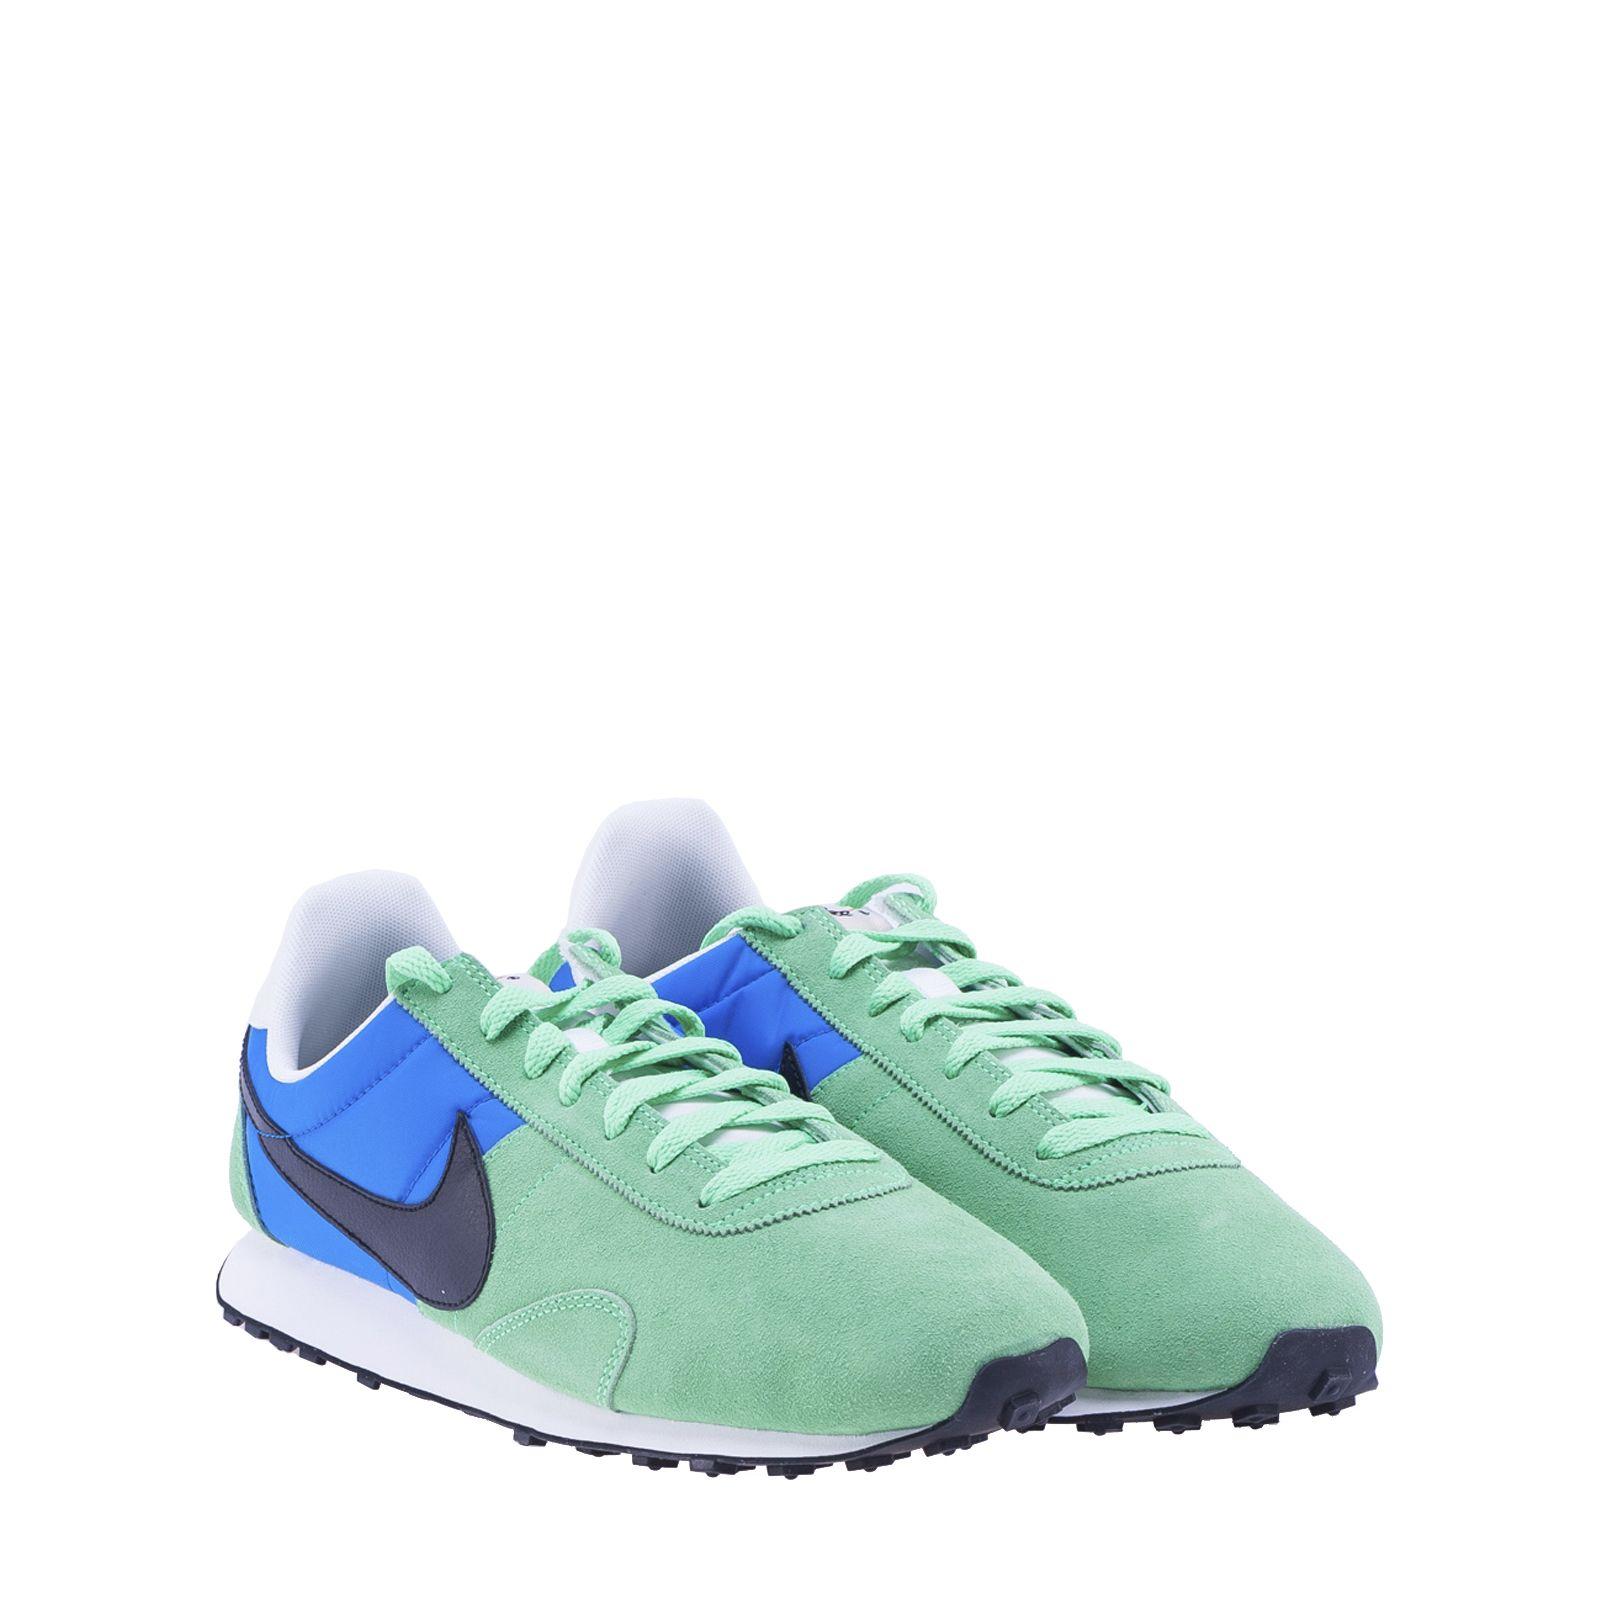 Nike Noir Pour Montréal CAgFCvYs4O